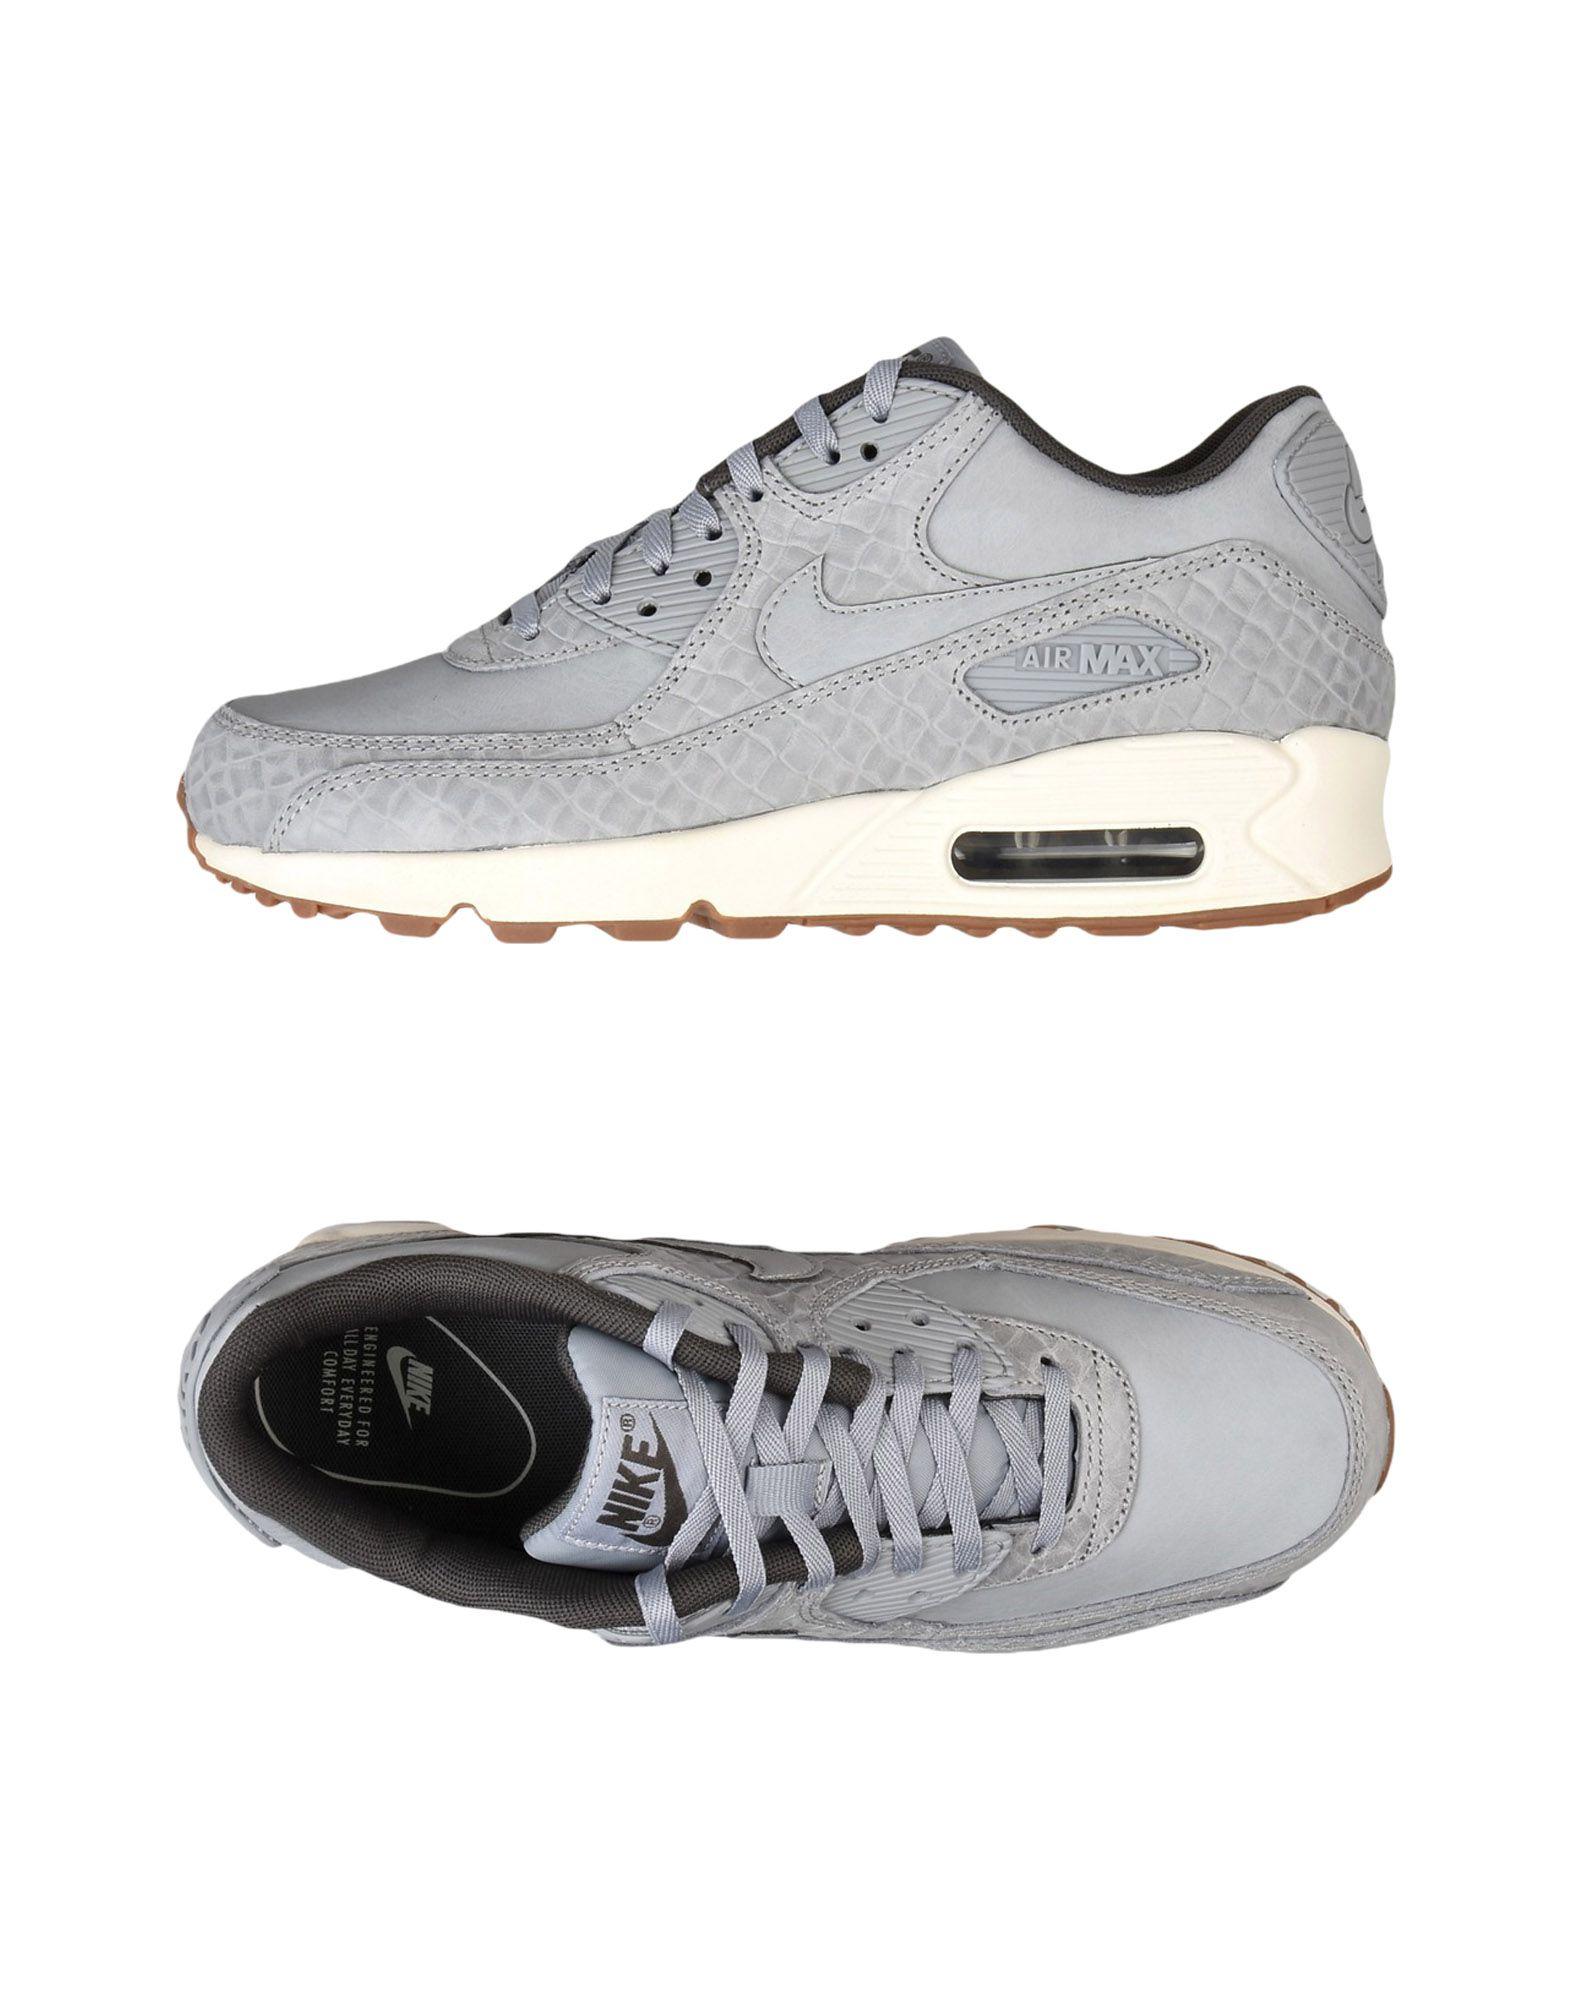 Nike Air es Max 90 Prem Gutes Preis-Leistungs-Verhältnis, es Air lohnt sich 3767 3bd948